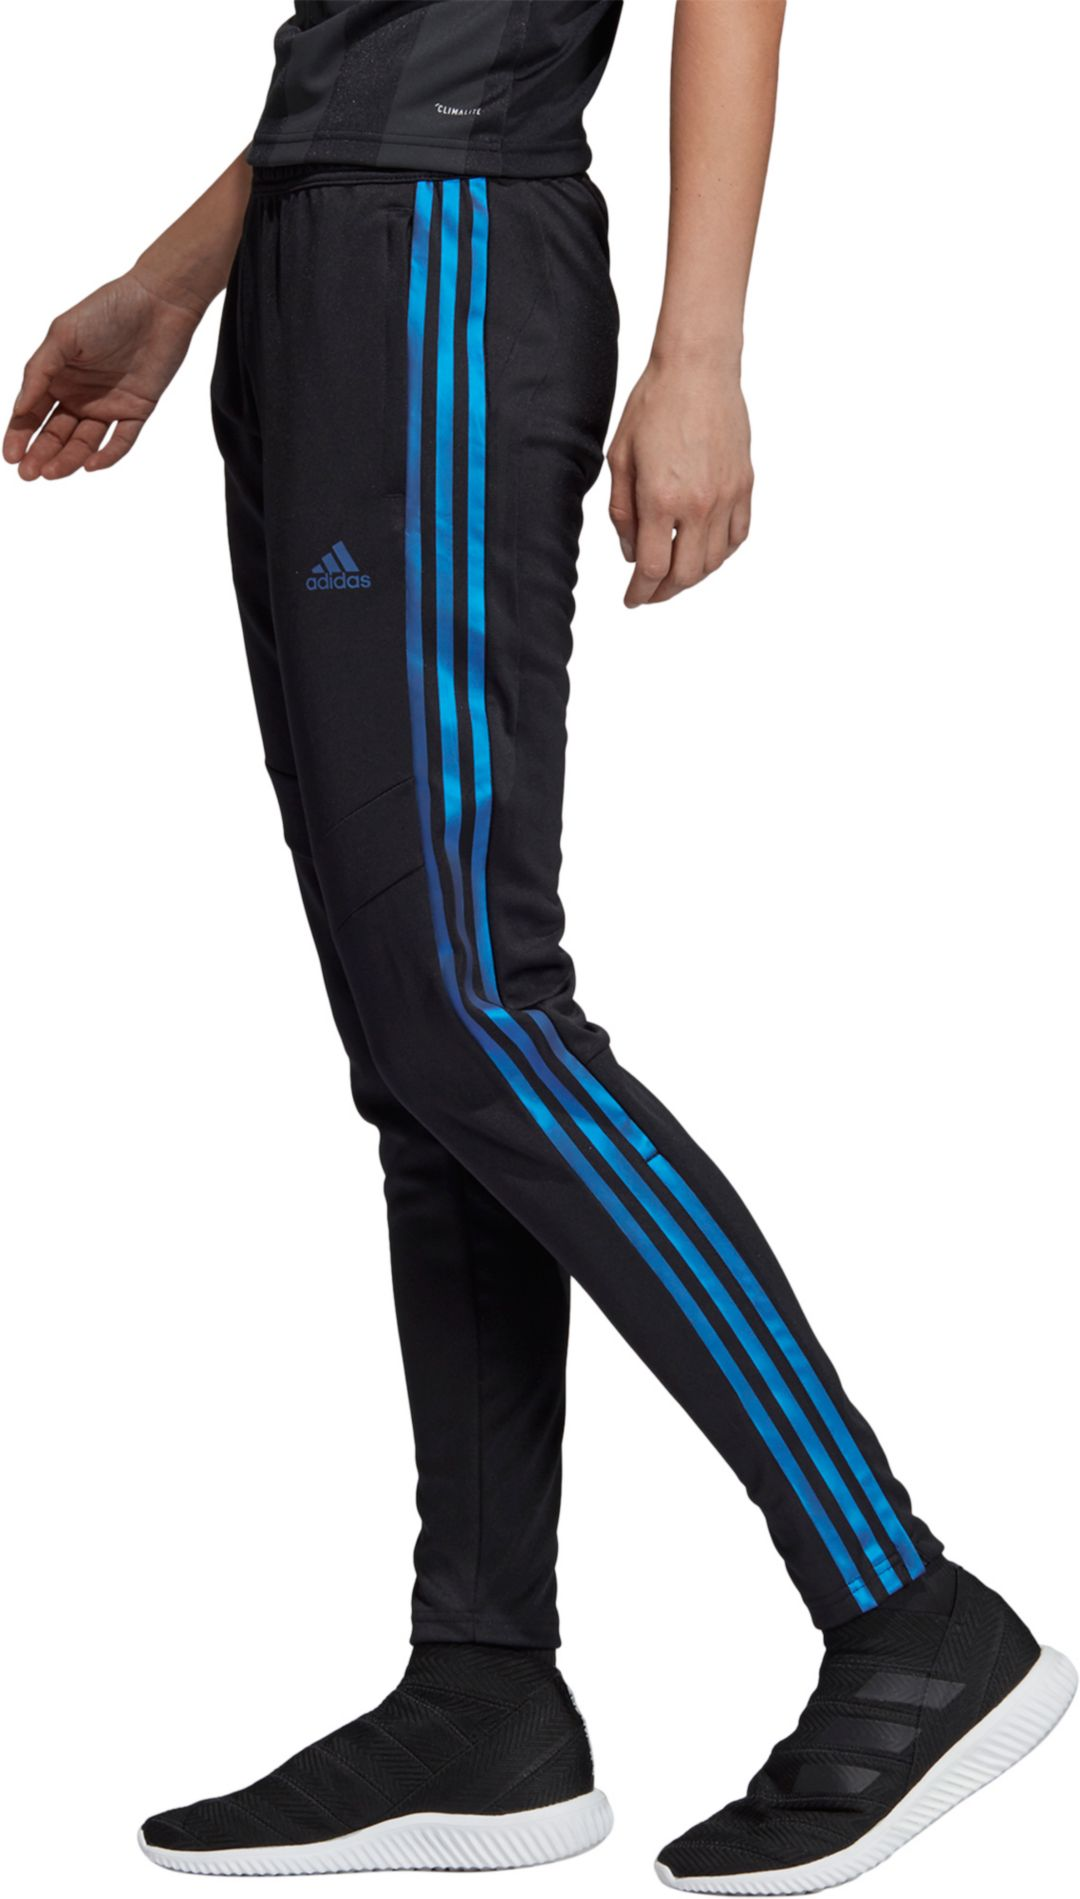 01b37aa8 adidas Women's Metallic Tiro 19 Soccer Training Pants. noImageFound.  Previous